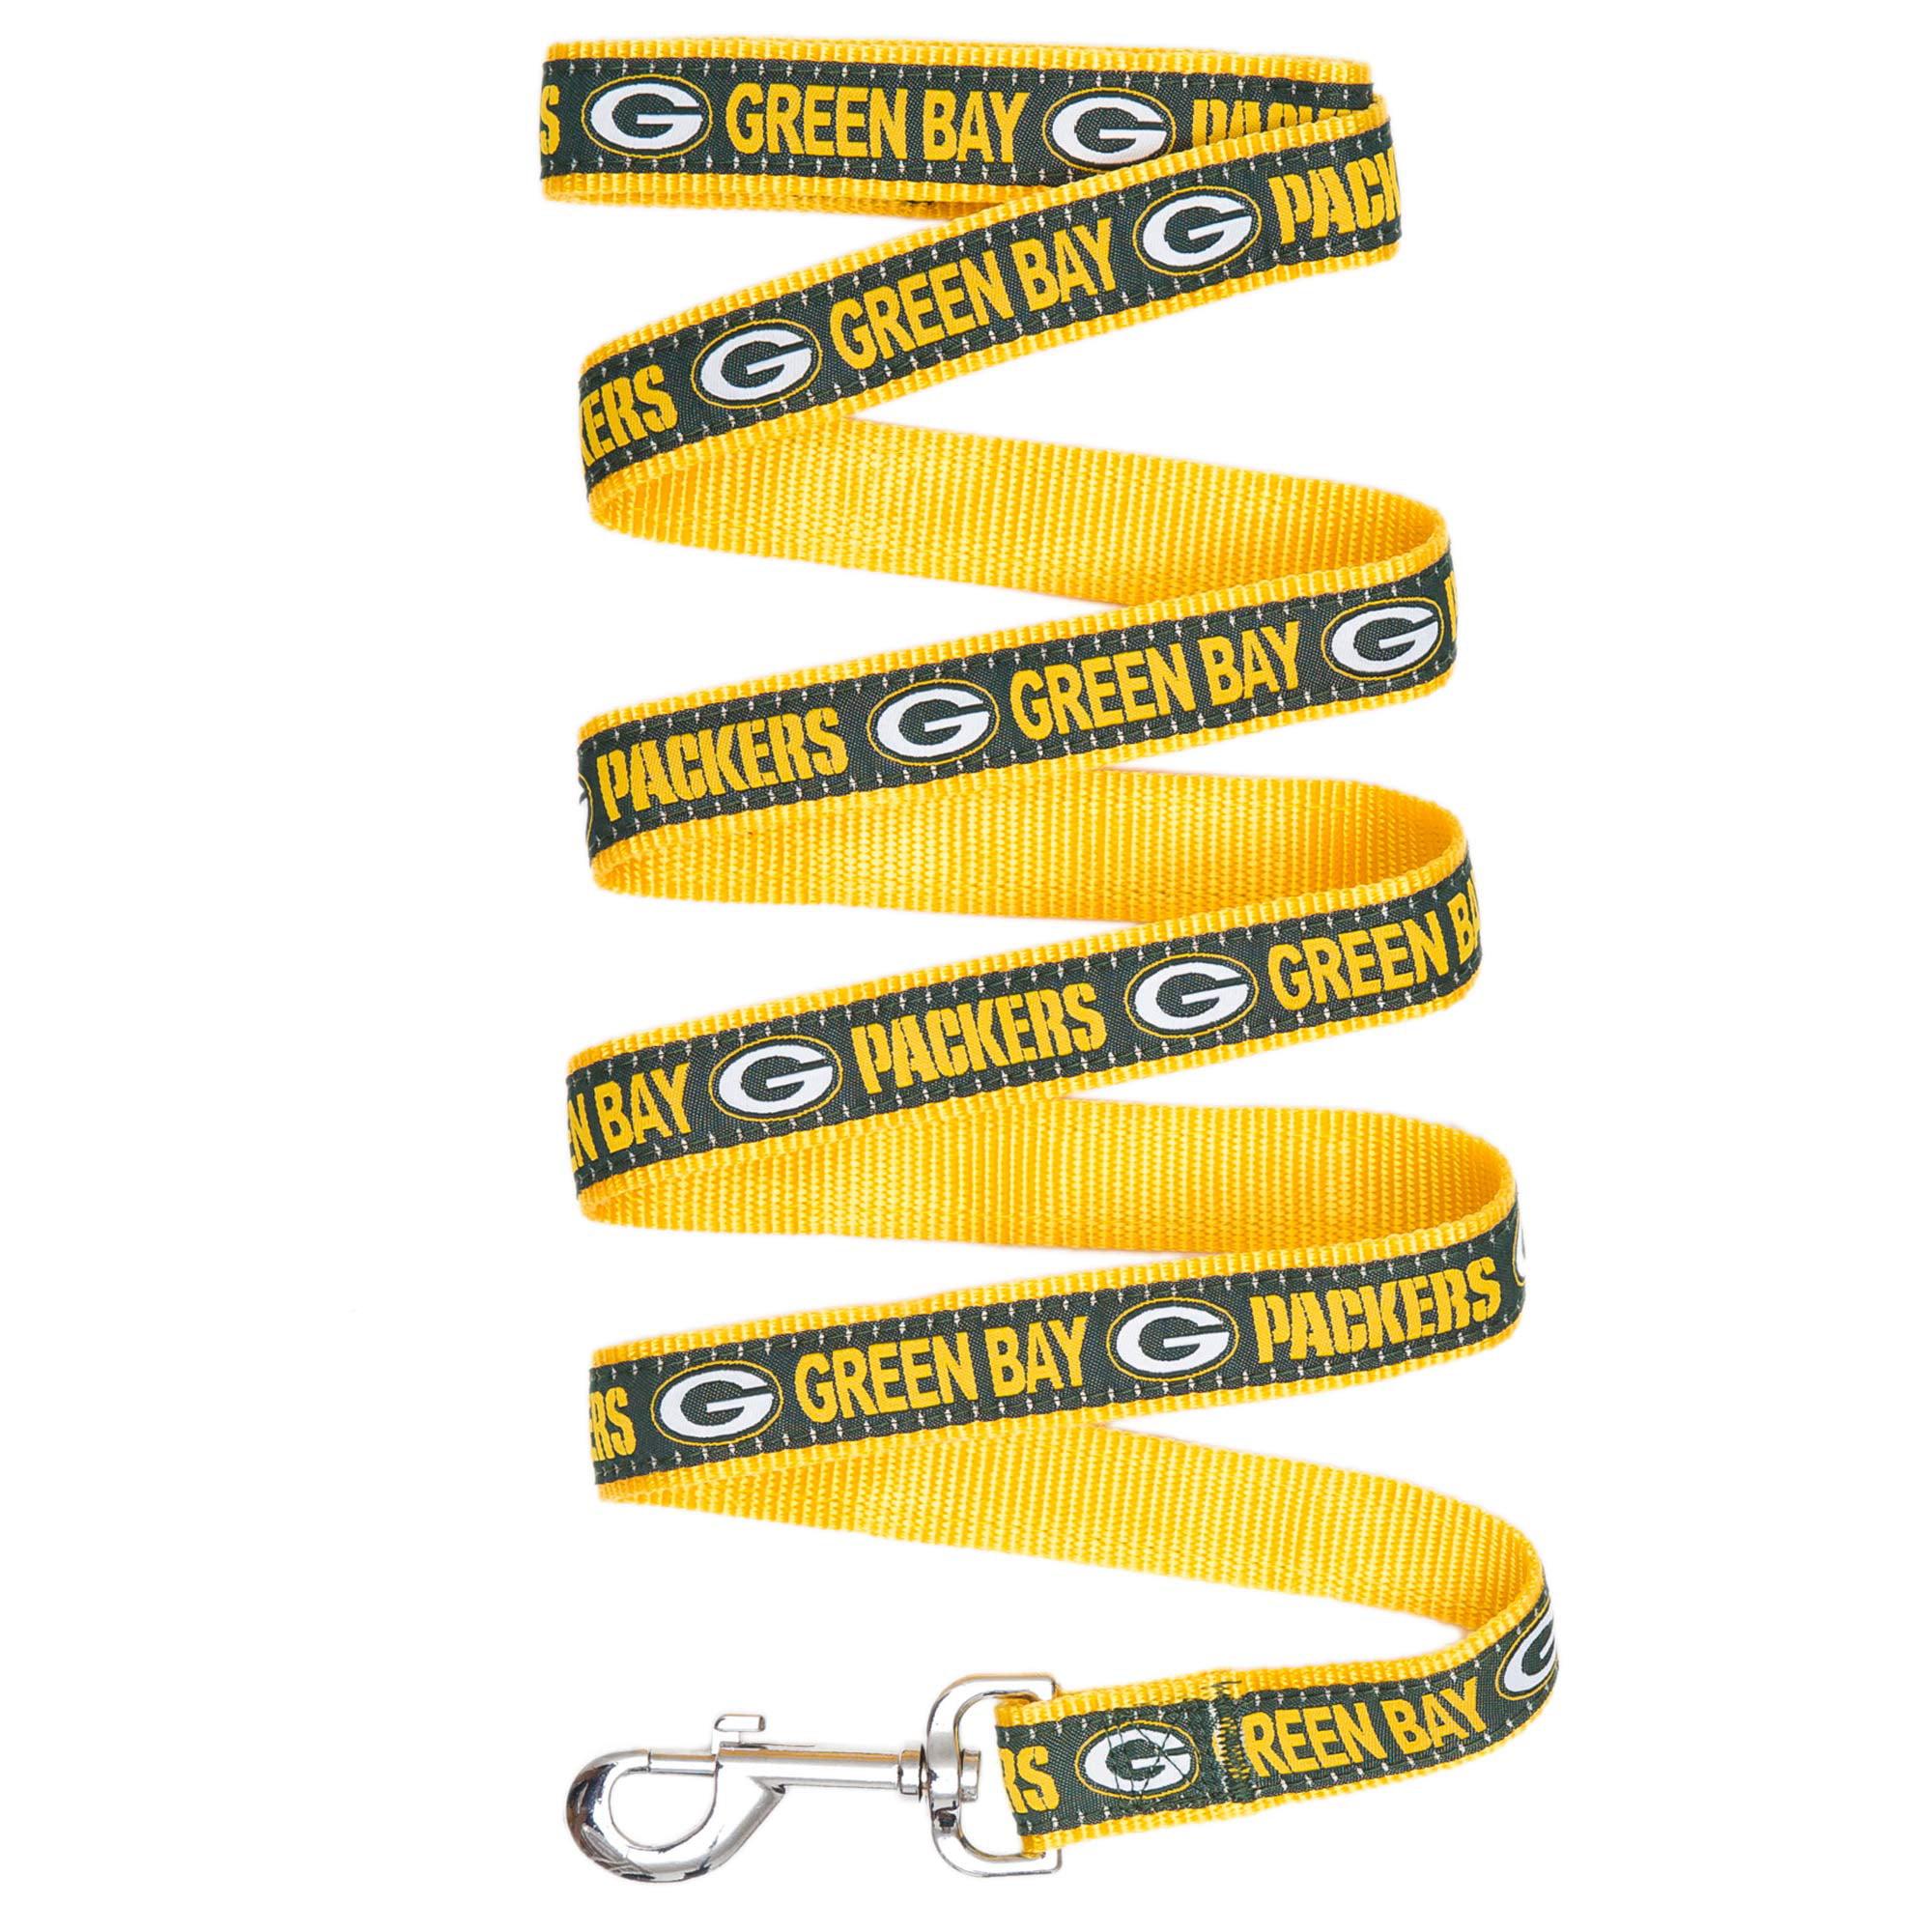 Green Bay Packers Leash